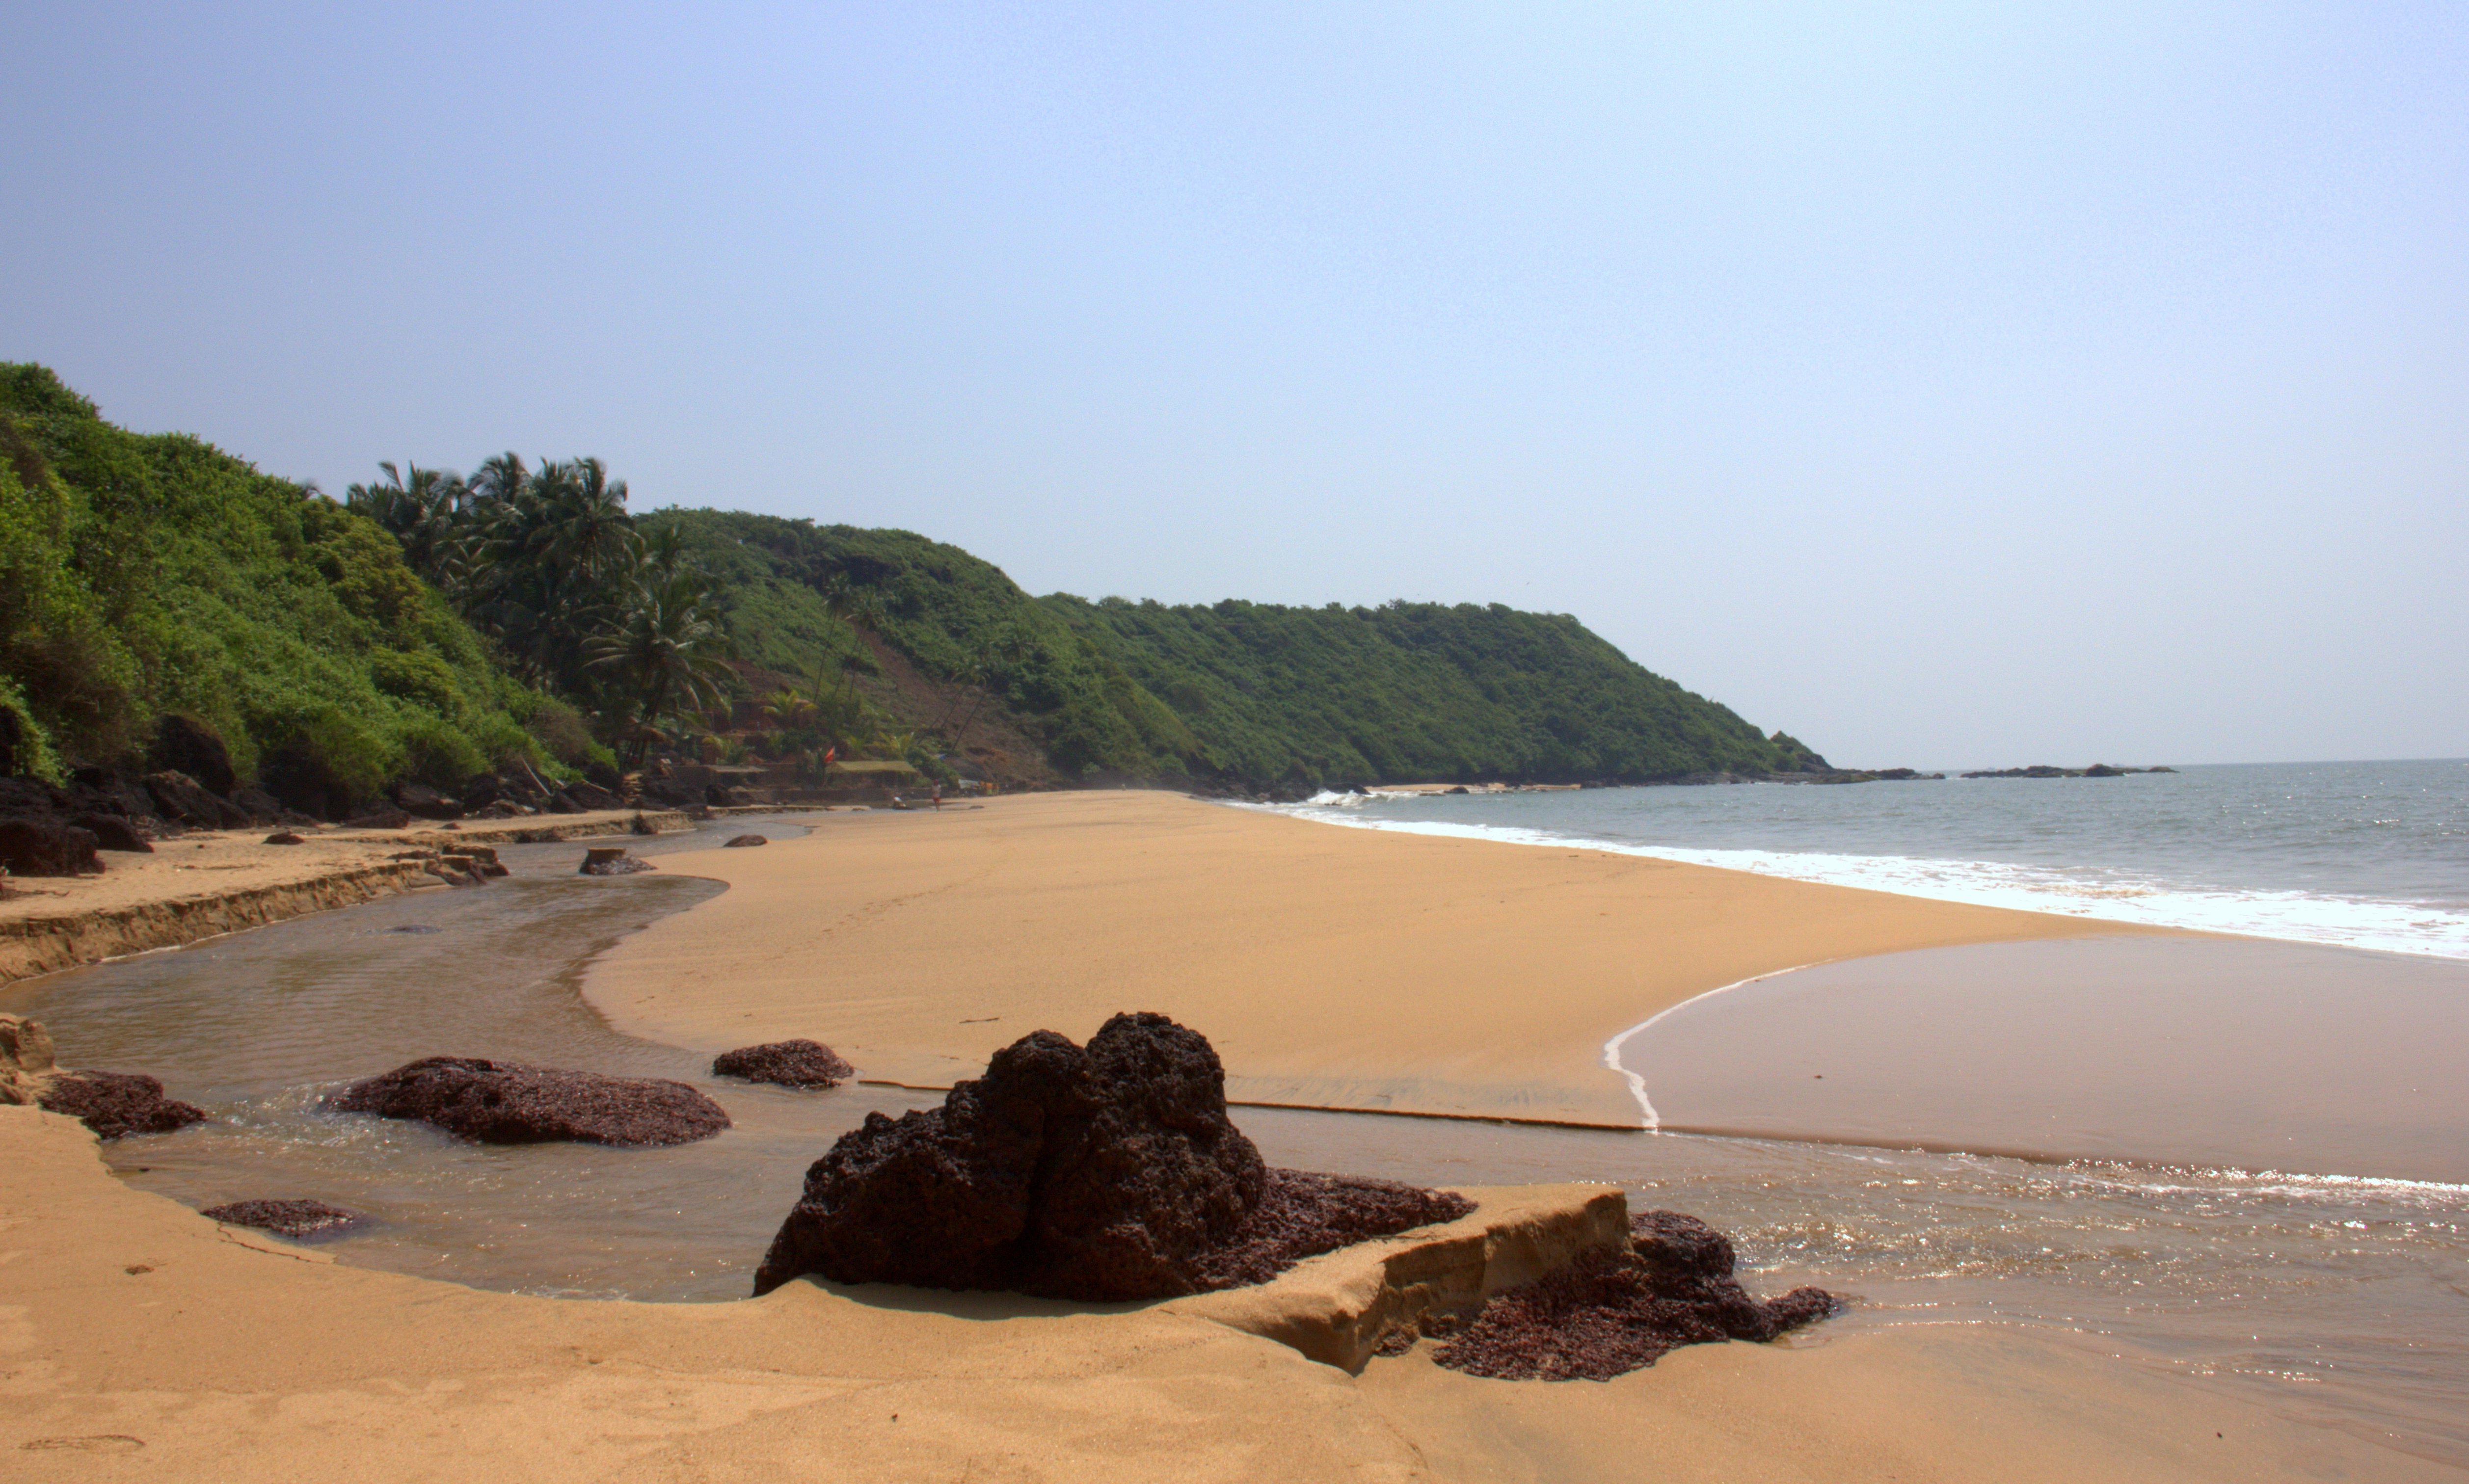 Some of my best Goa days